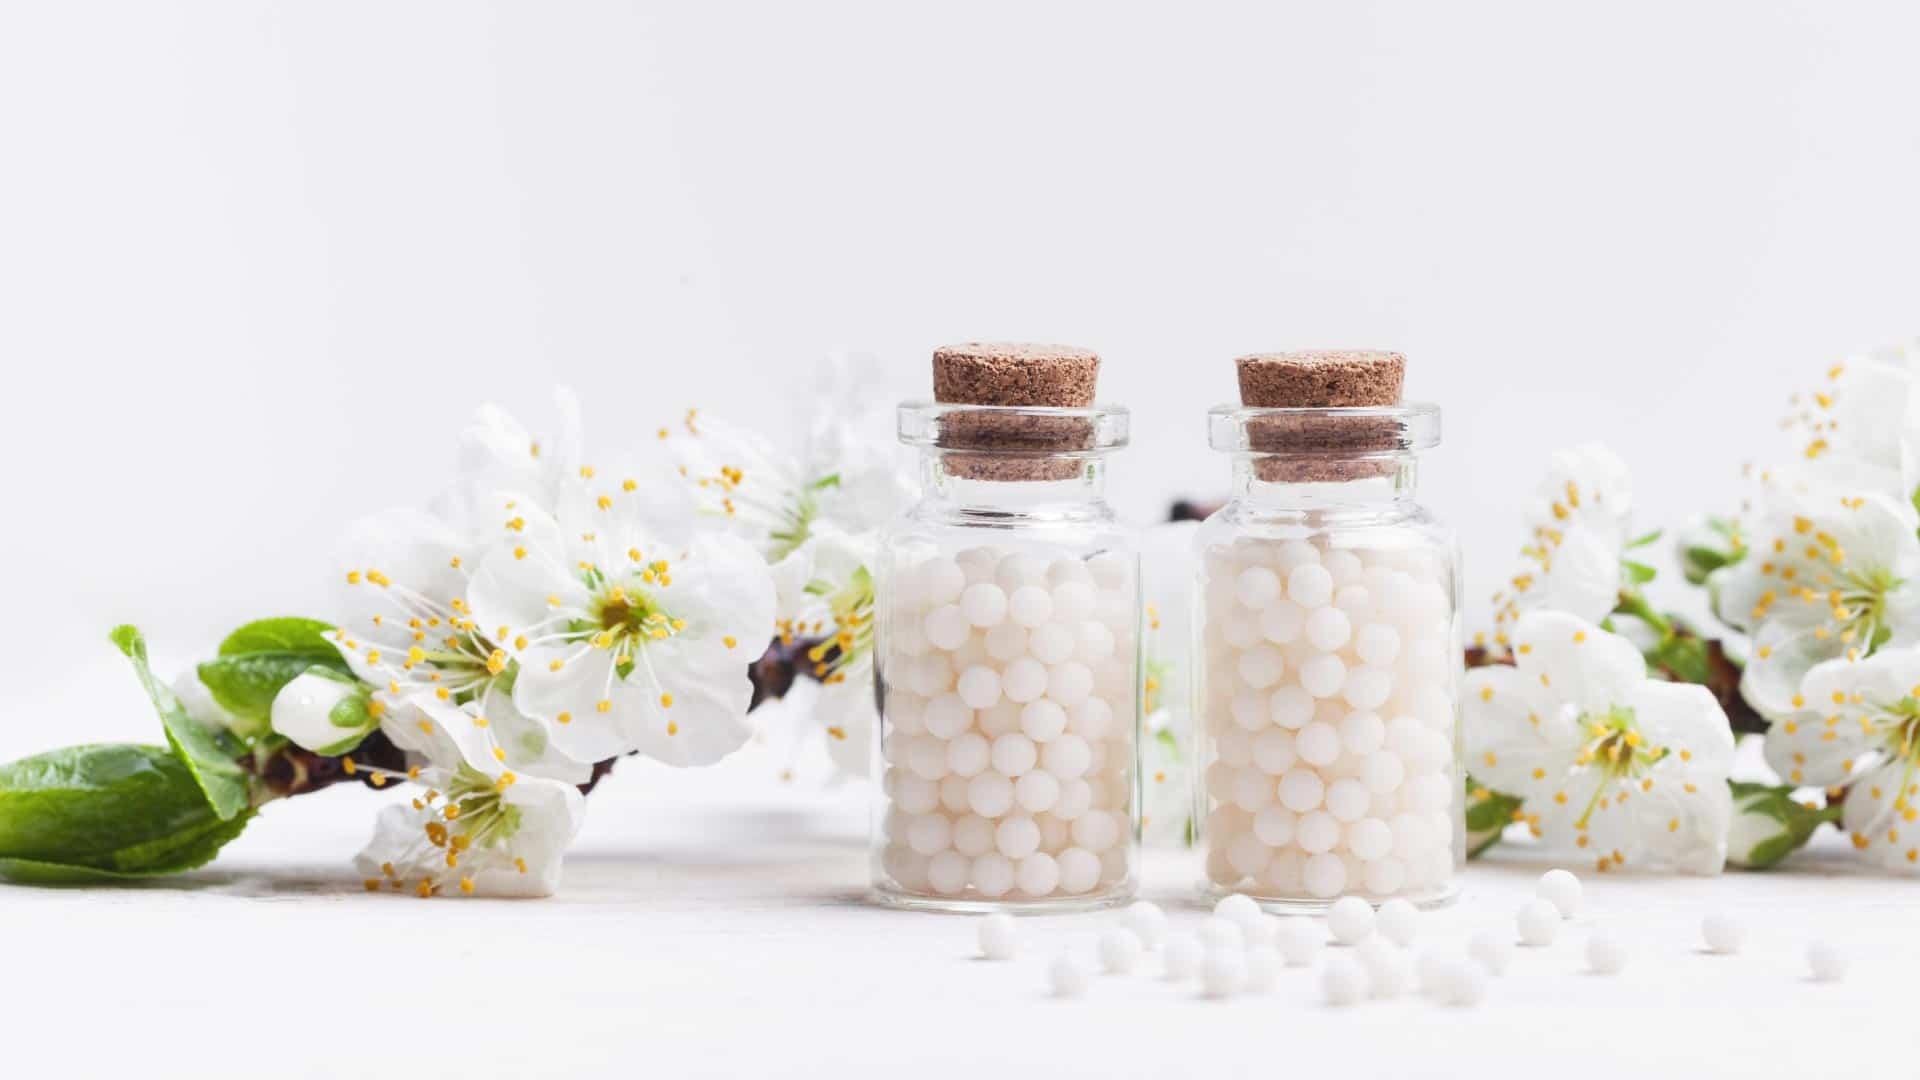 10 dúvidas frequentes sobre a Homeopatia